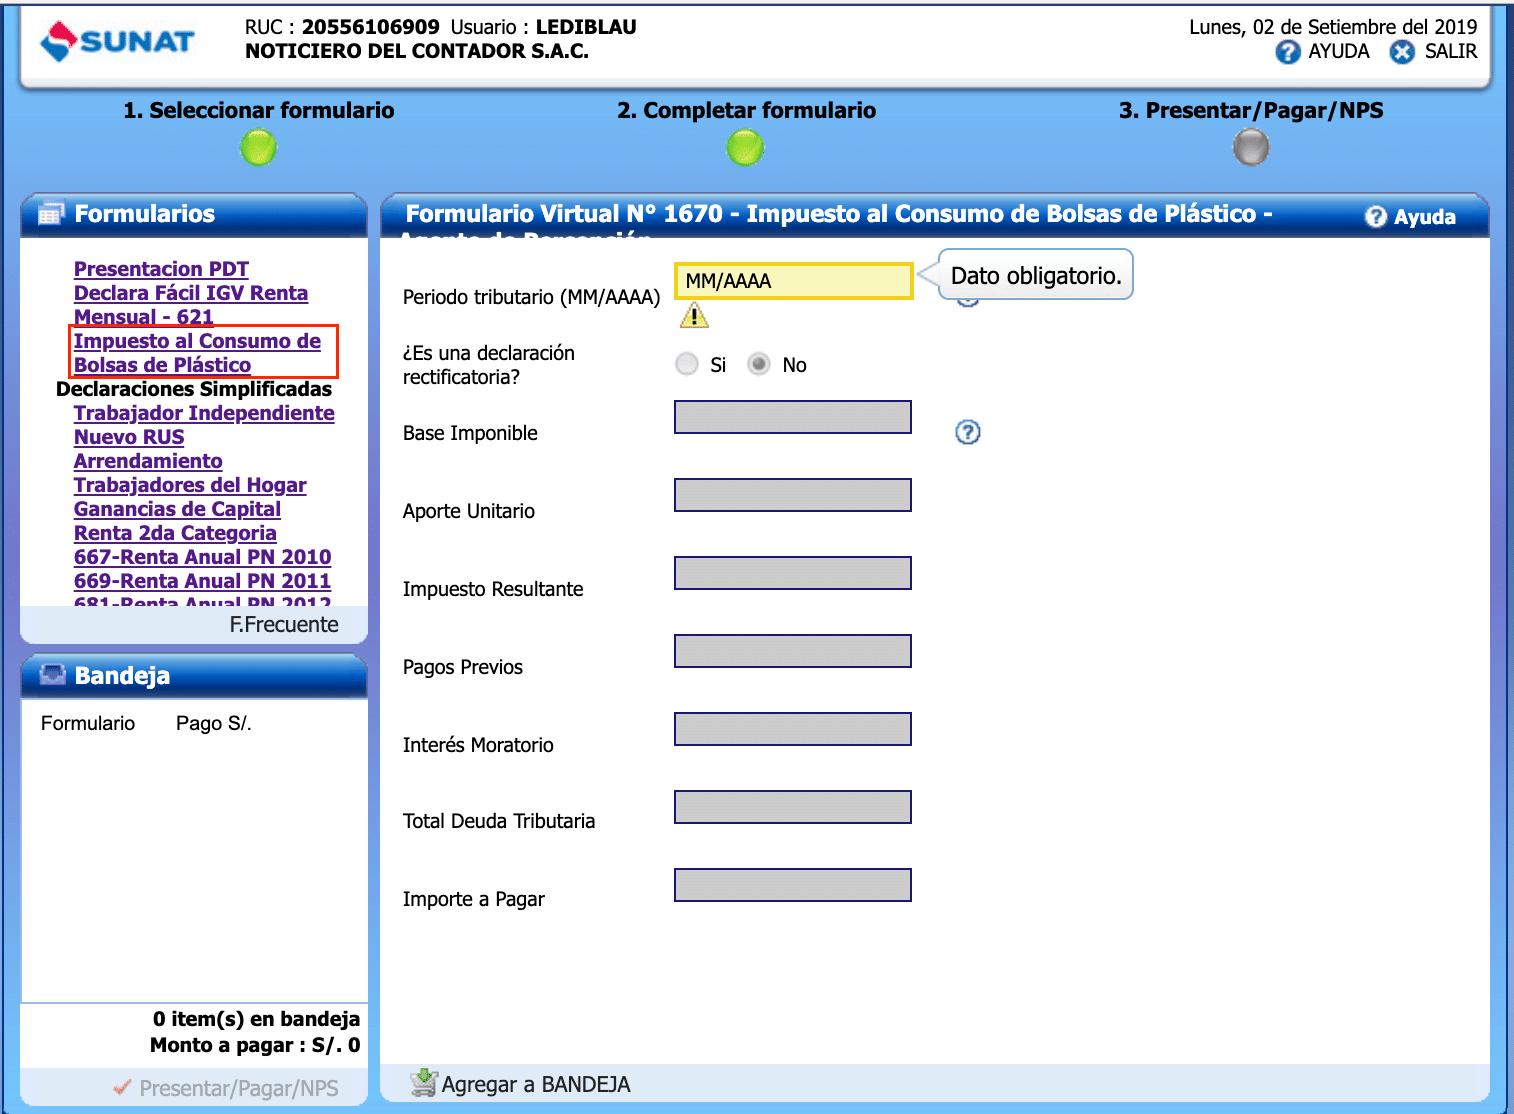 Formulario Virtual 1670